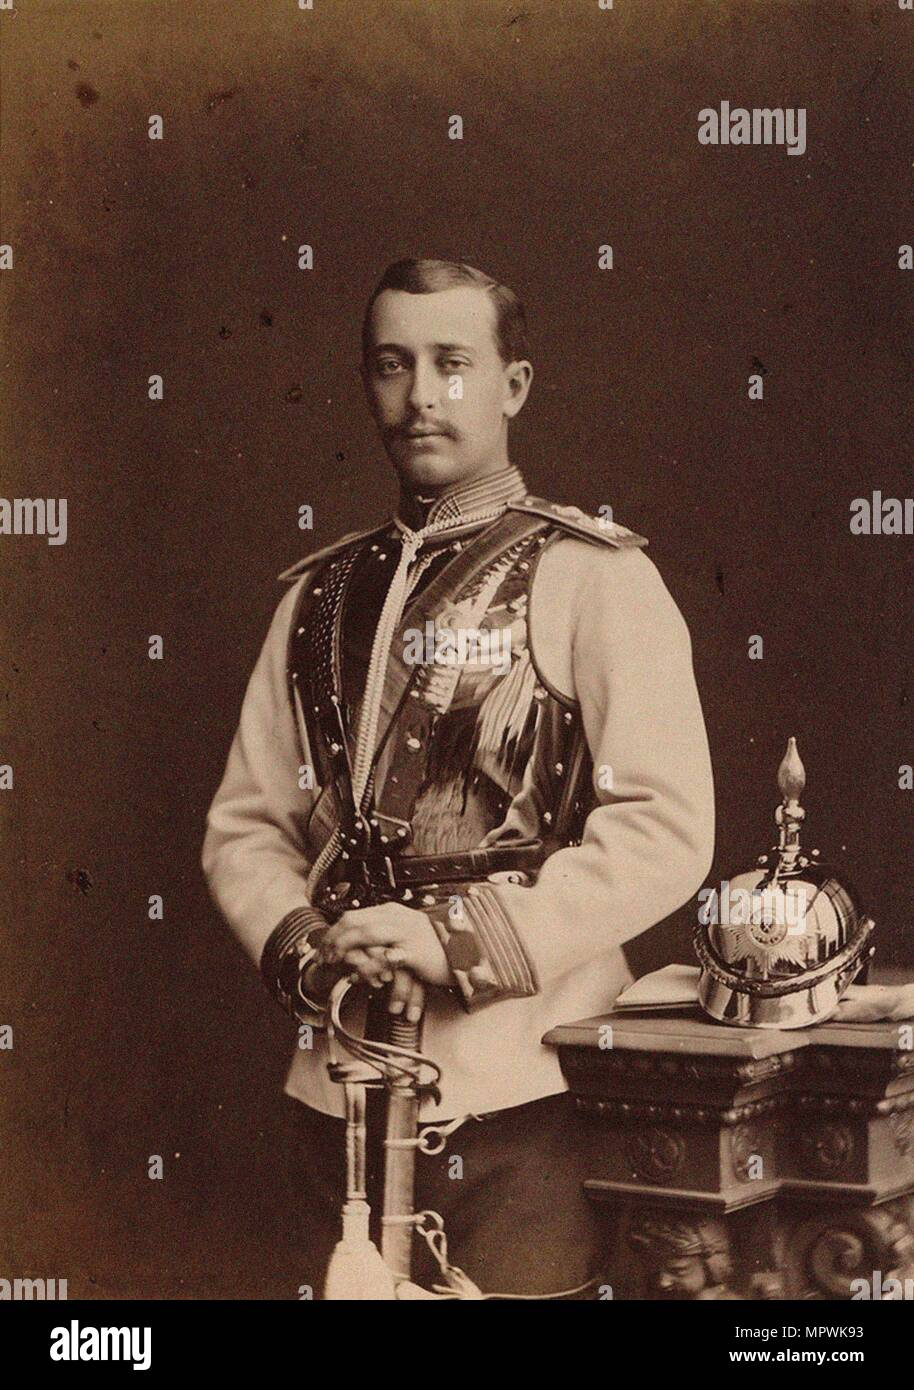 Portrait of Grand Duke Sergei Maximilianovich of Leuchtenberg (1849-1877), 1873. - Stock Image